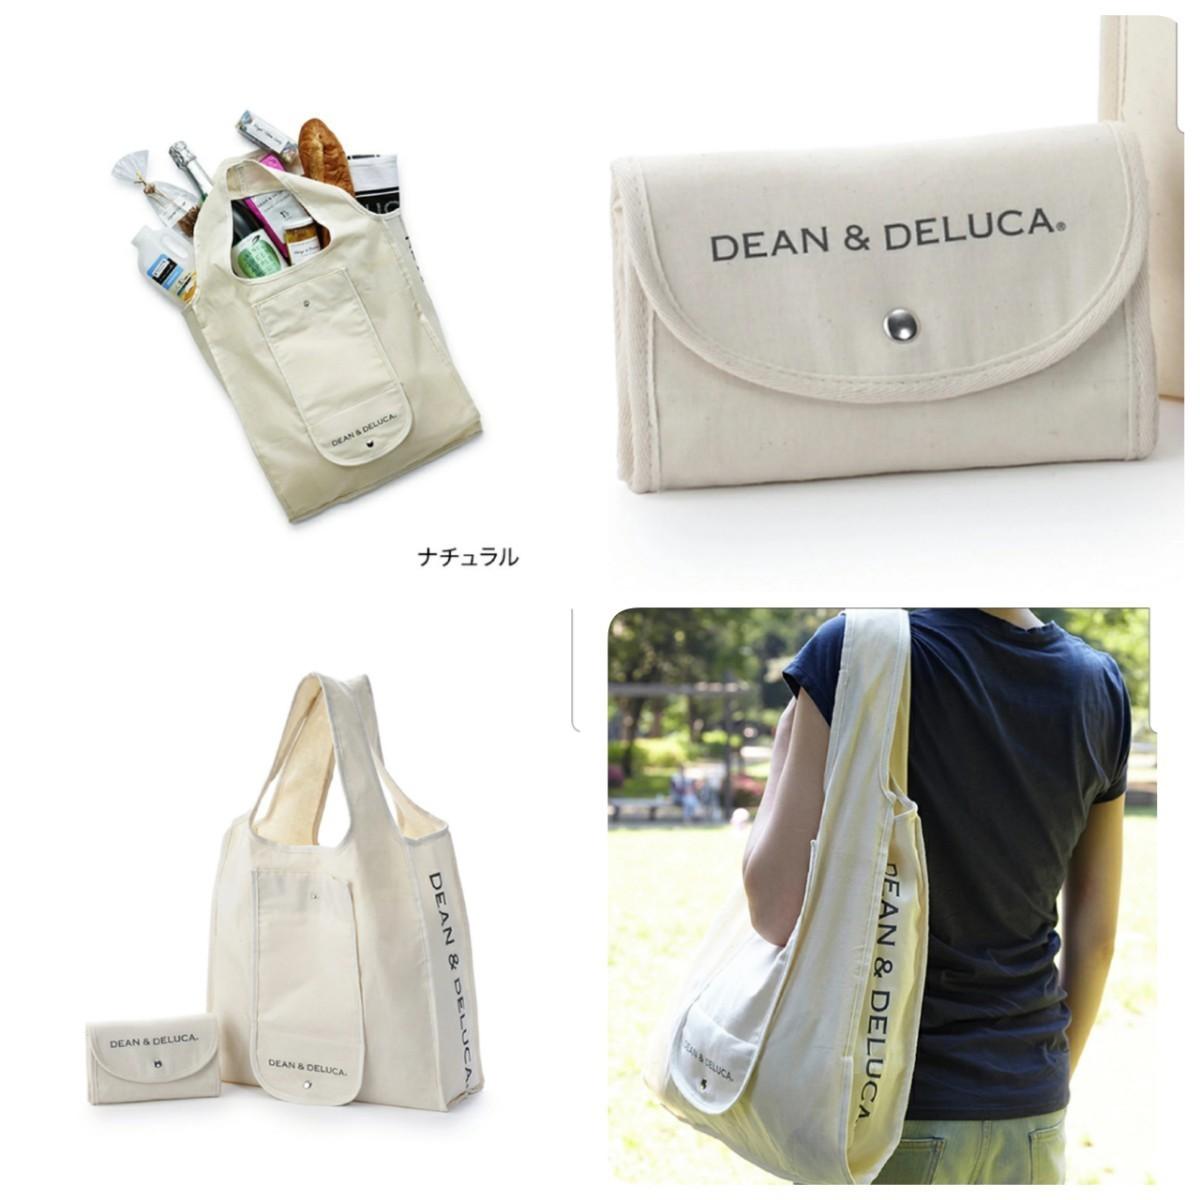 DEAN&DELUCA ディーンアンドデルーカ エコバッグ ミニマムエコバッグ トートバッグ ショッピングバッグ